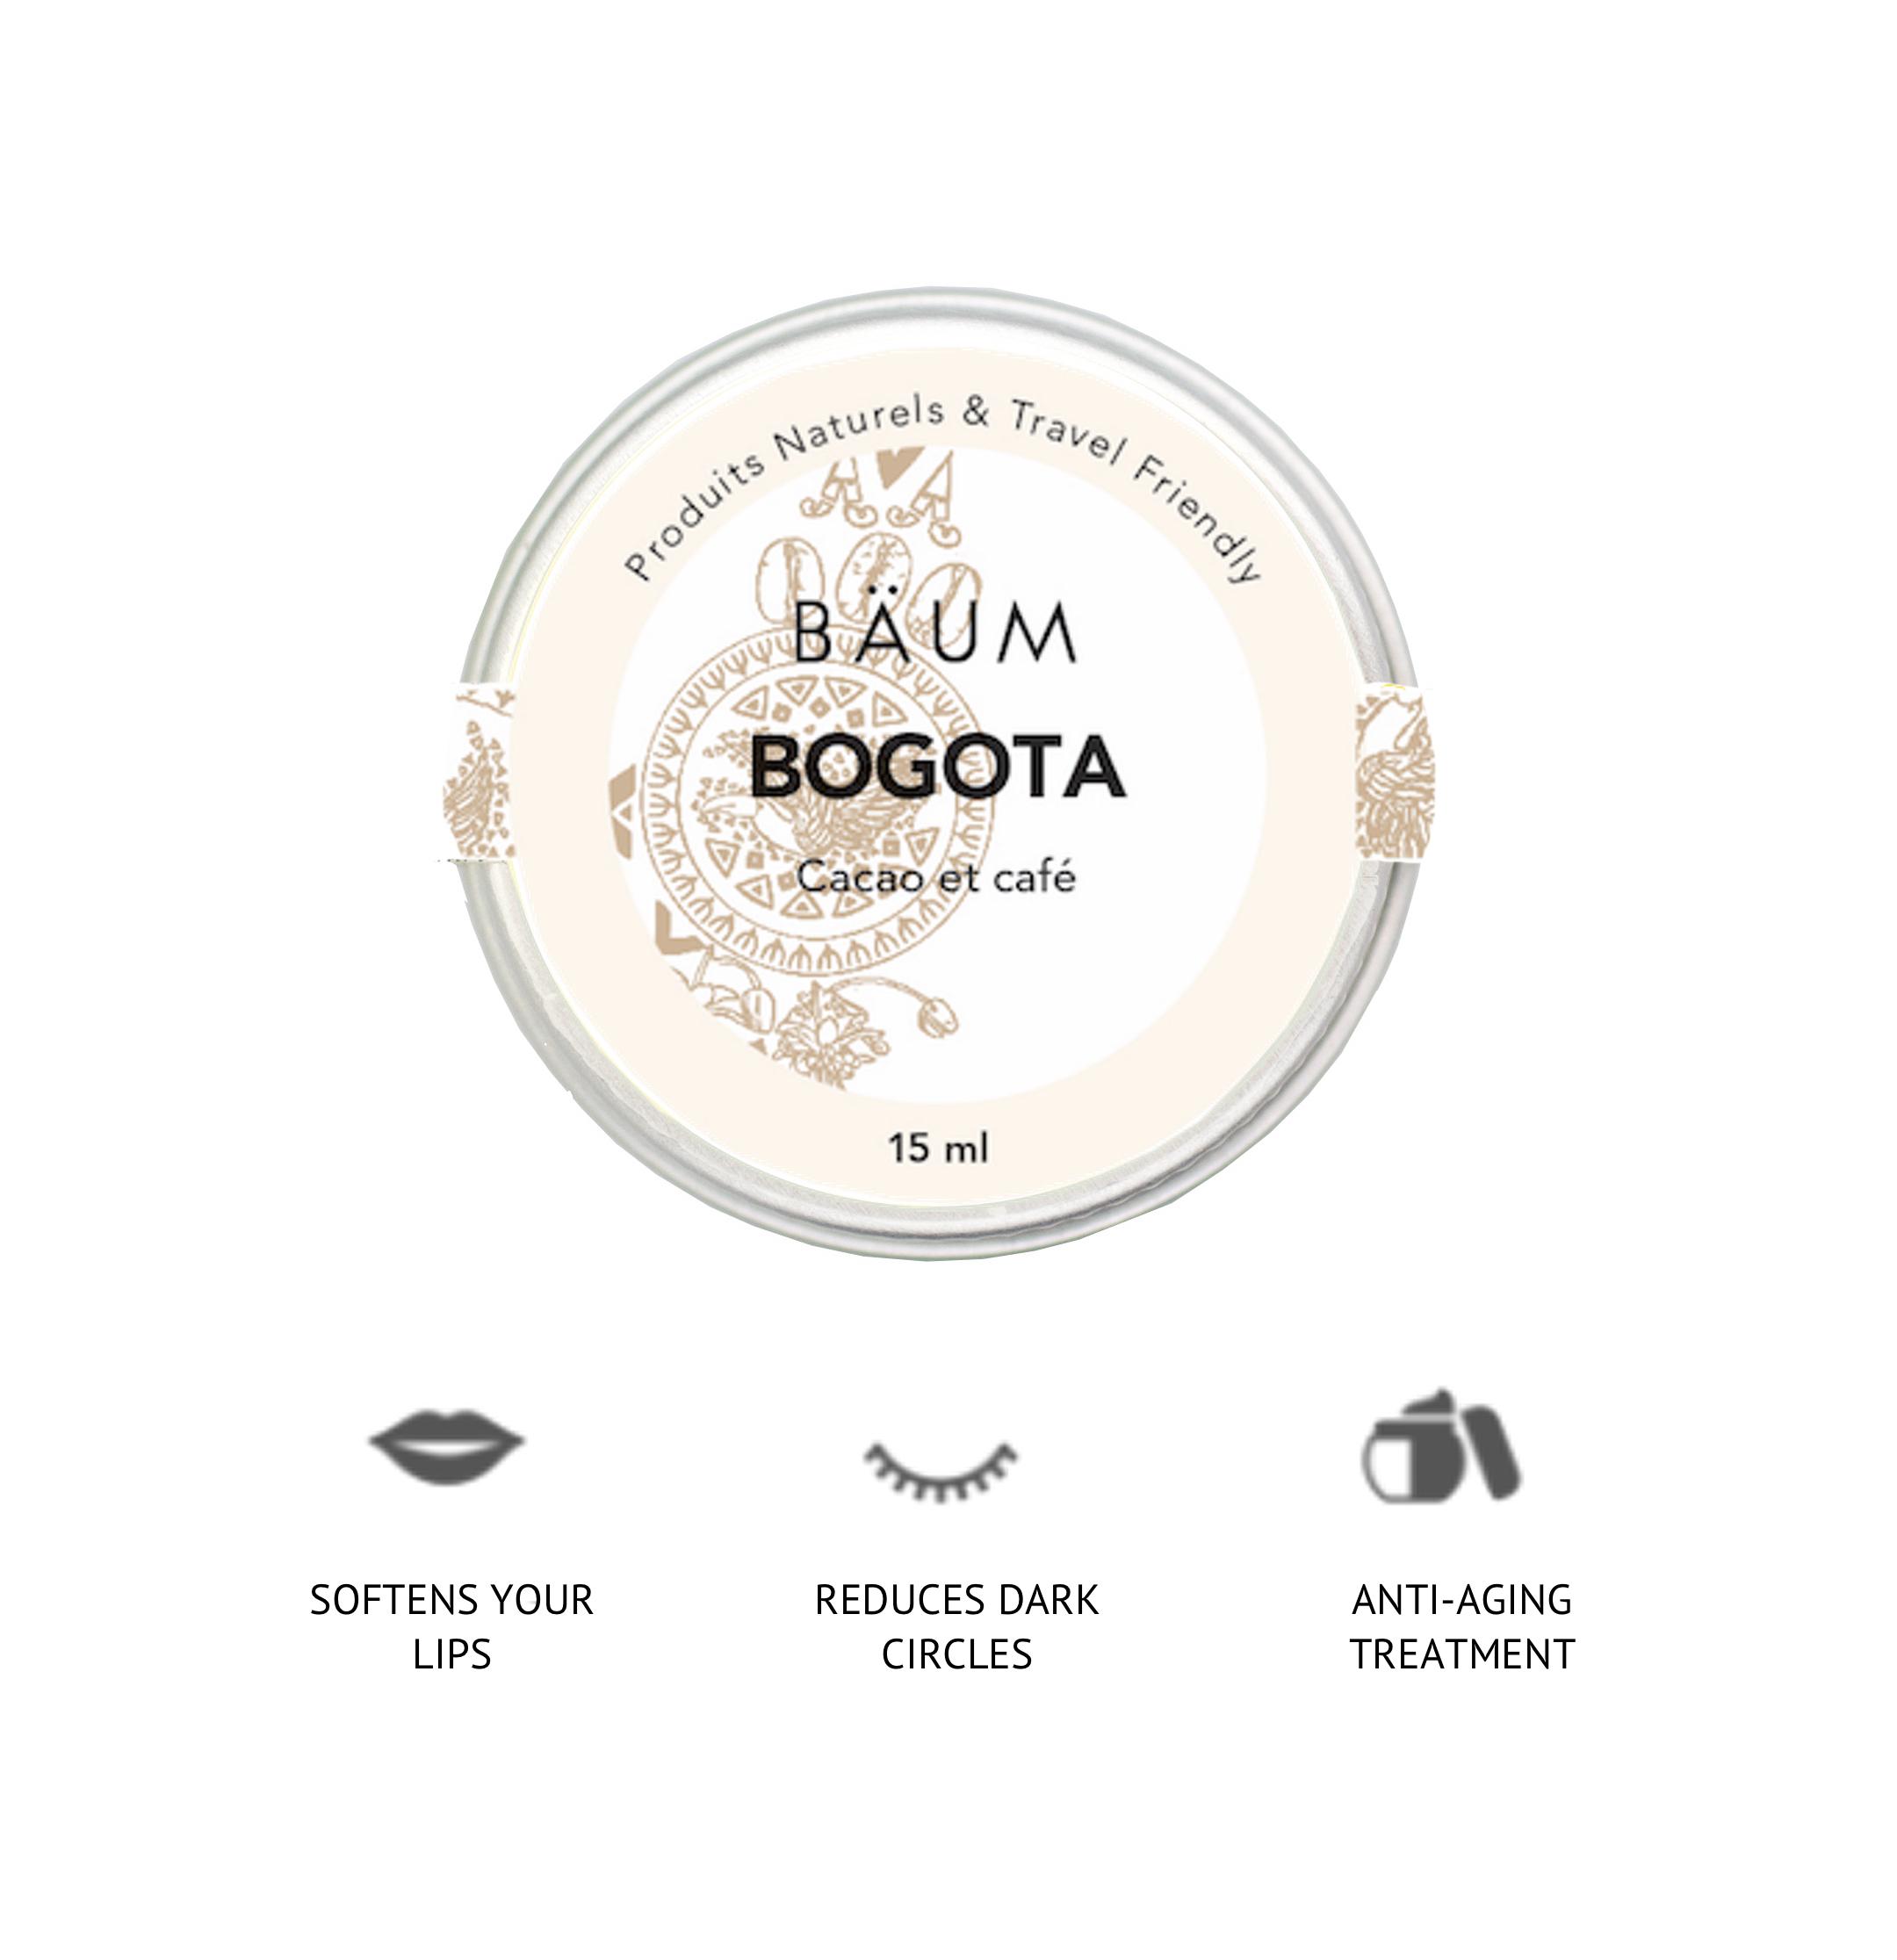 VF_product description eng_bogota.jpg